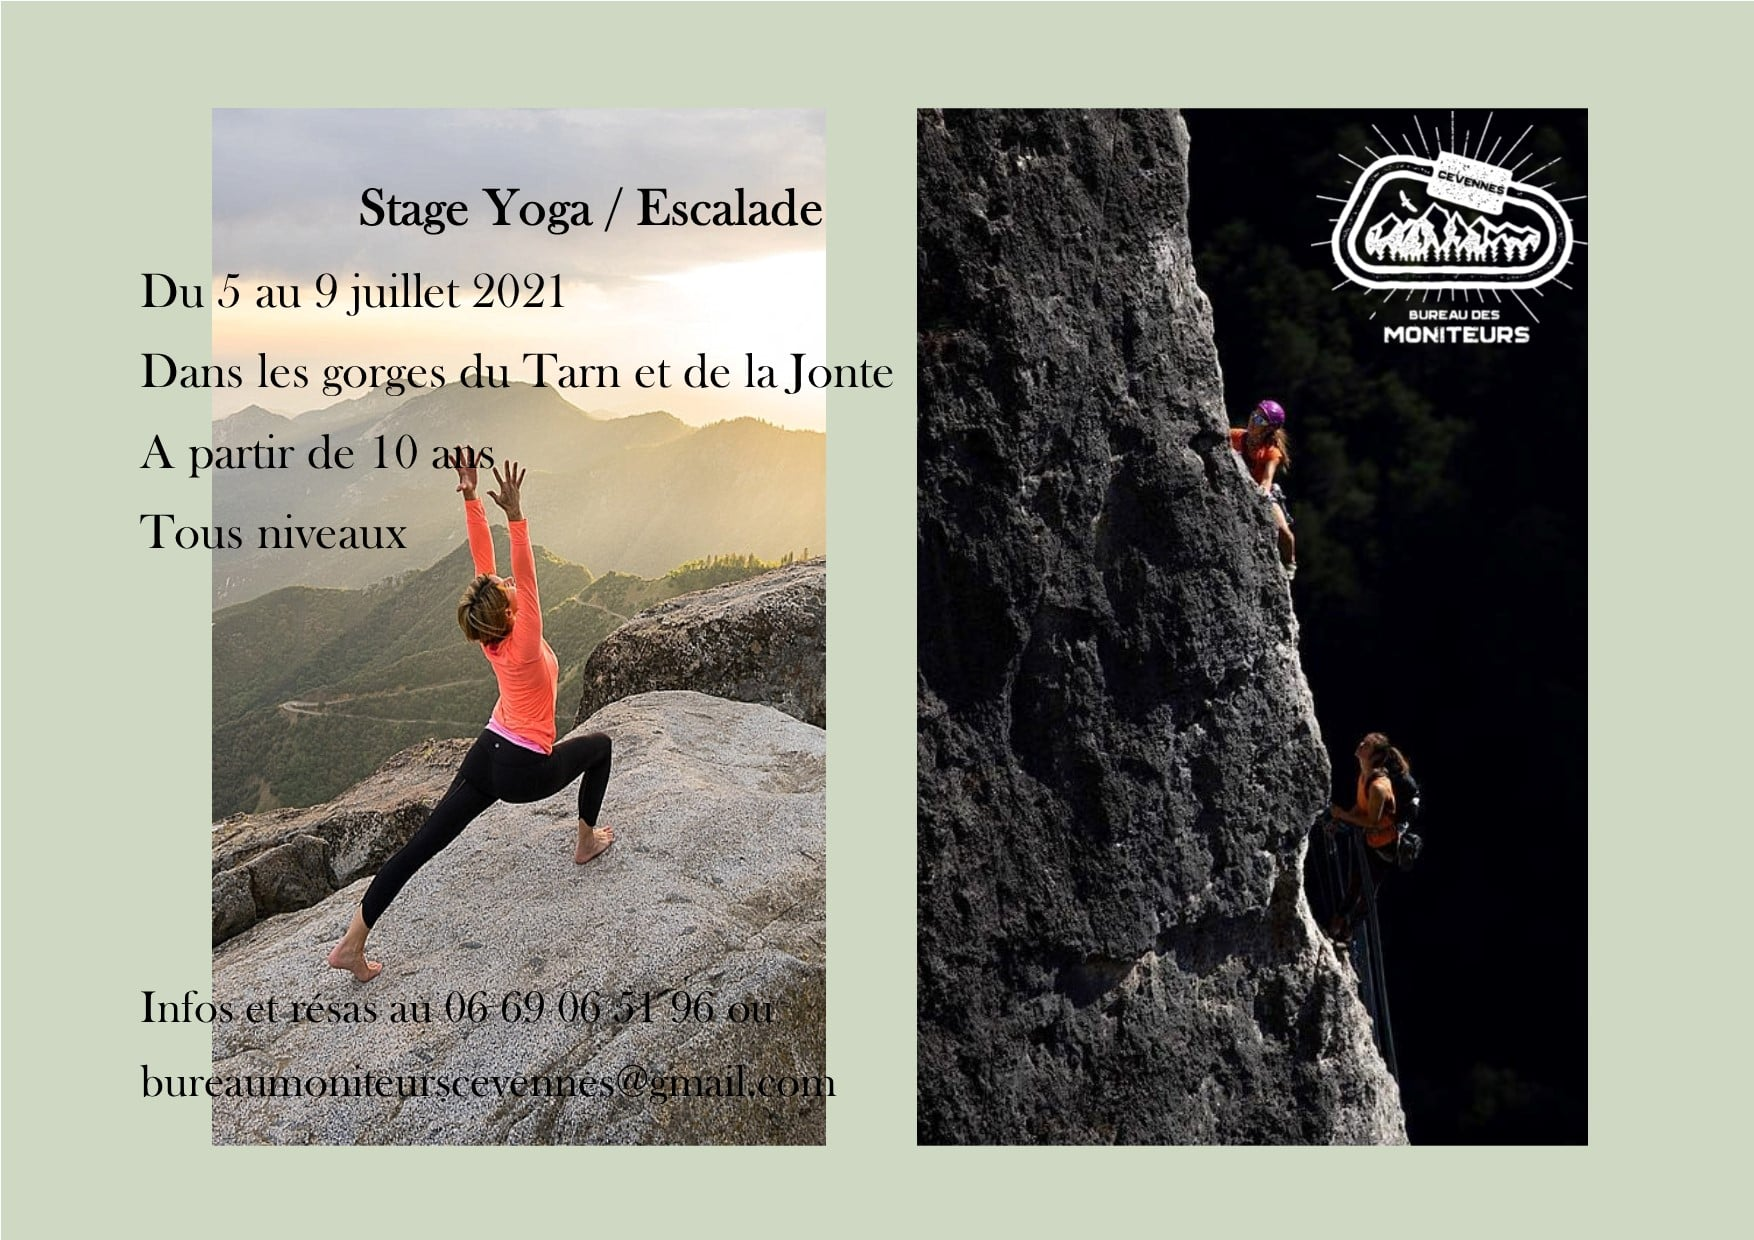 stage yoga escalade aveyron cevennes millau gorges de la jonte